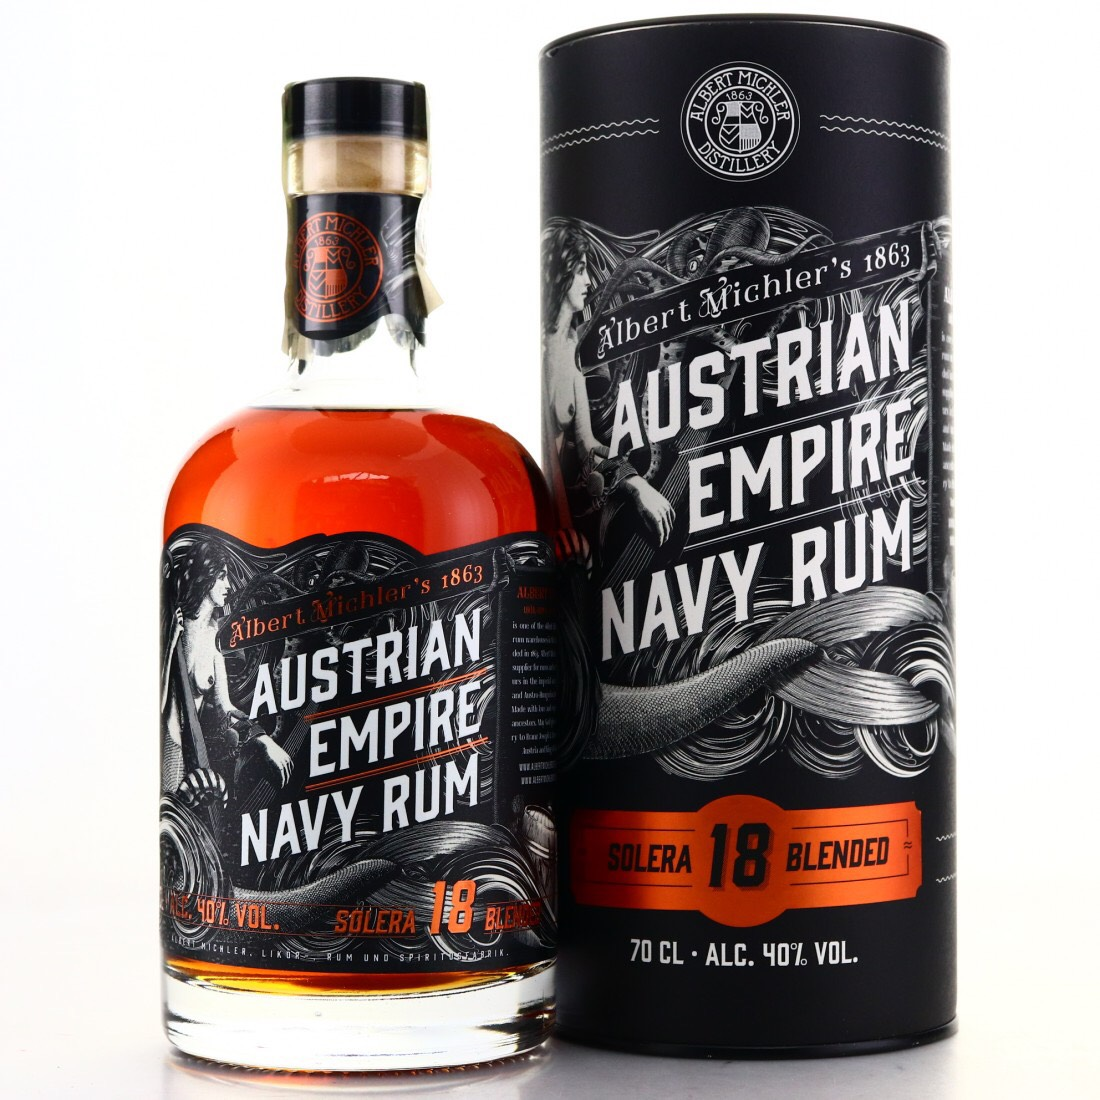 Bottle image of Austrian Empire Navy Rum Solera 18